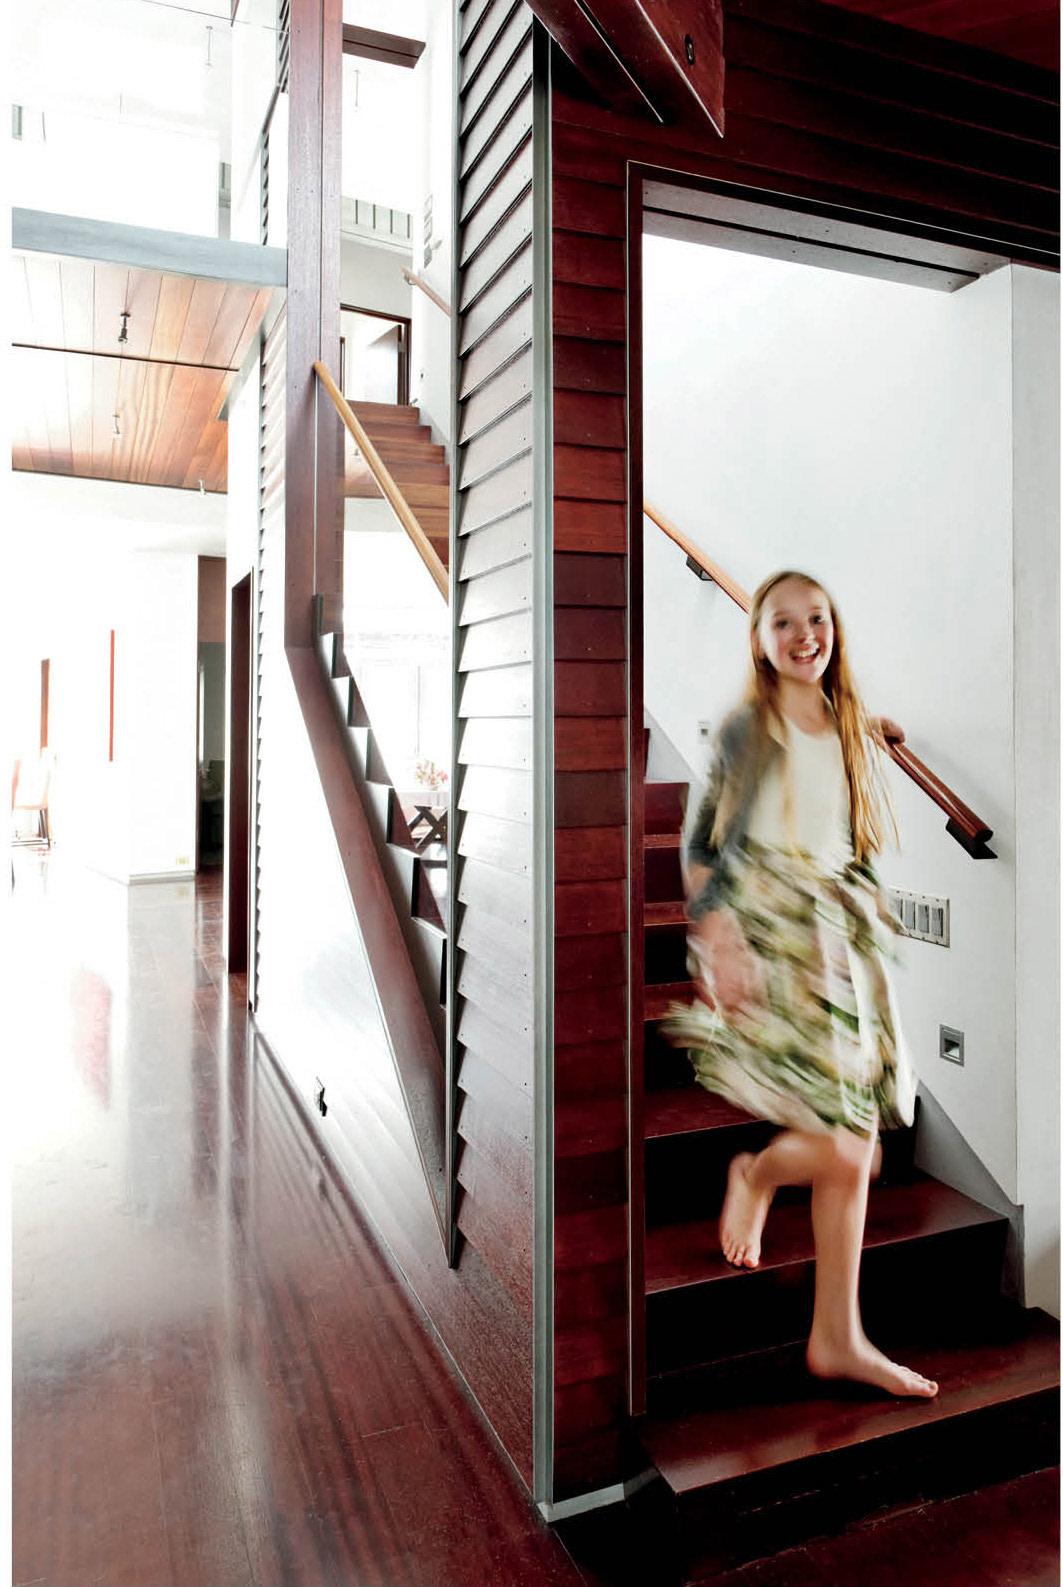 0513 aspen ideal girl on stairs dubhxj